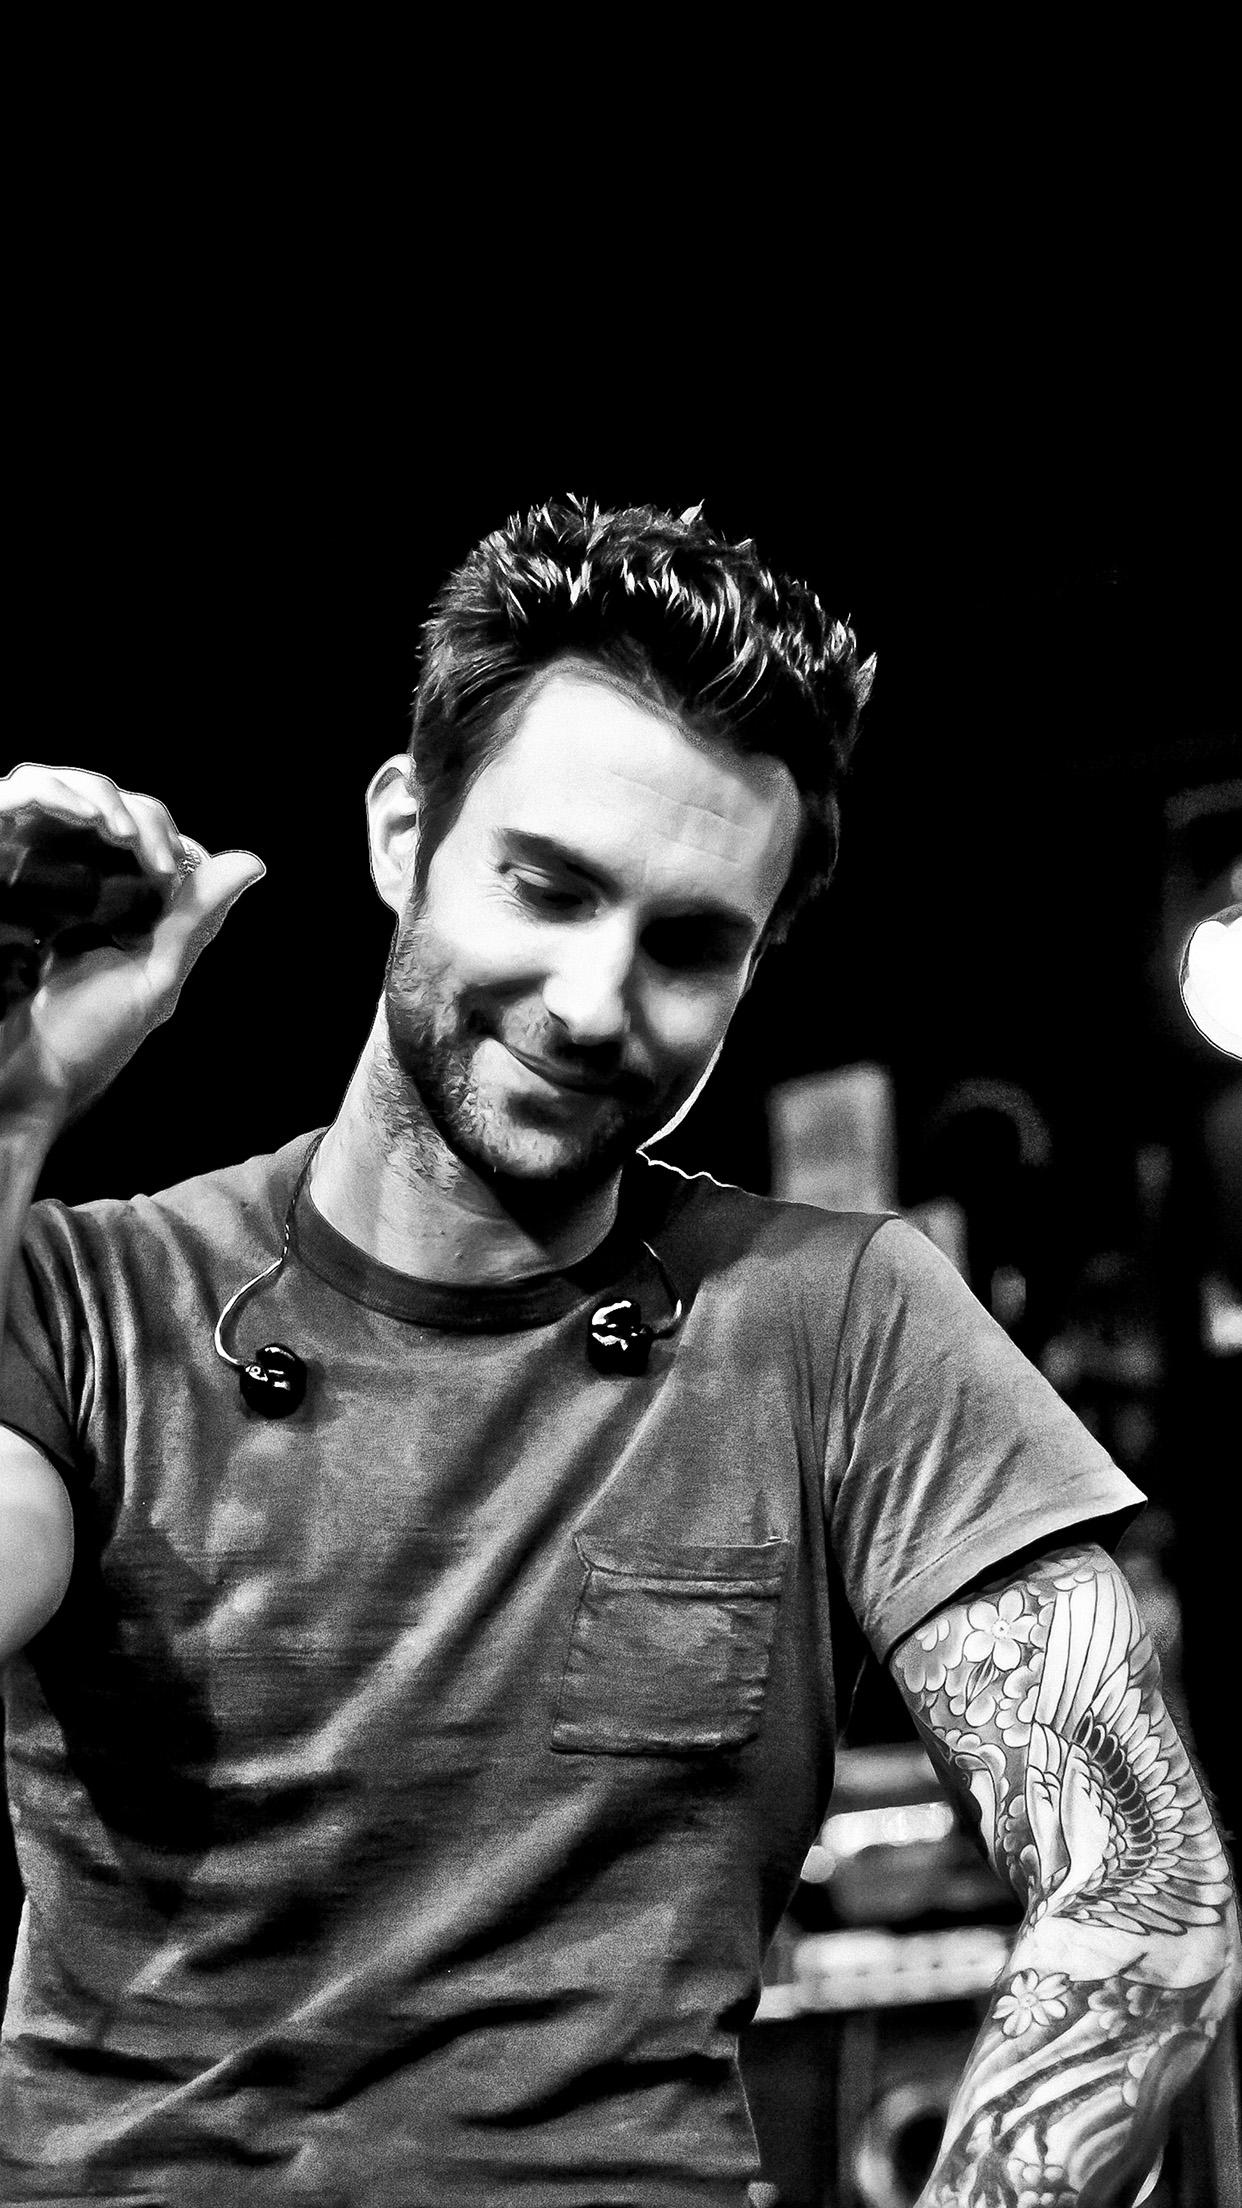 Car Boy Hd Wallpaper Hg17 Maroon 5 Adam Levine Singer Artist Music Dark Papers Co